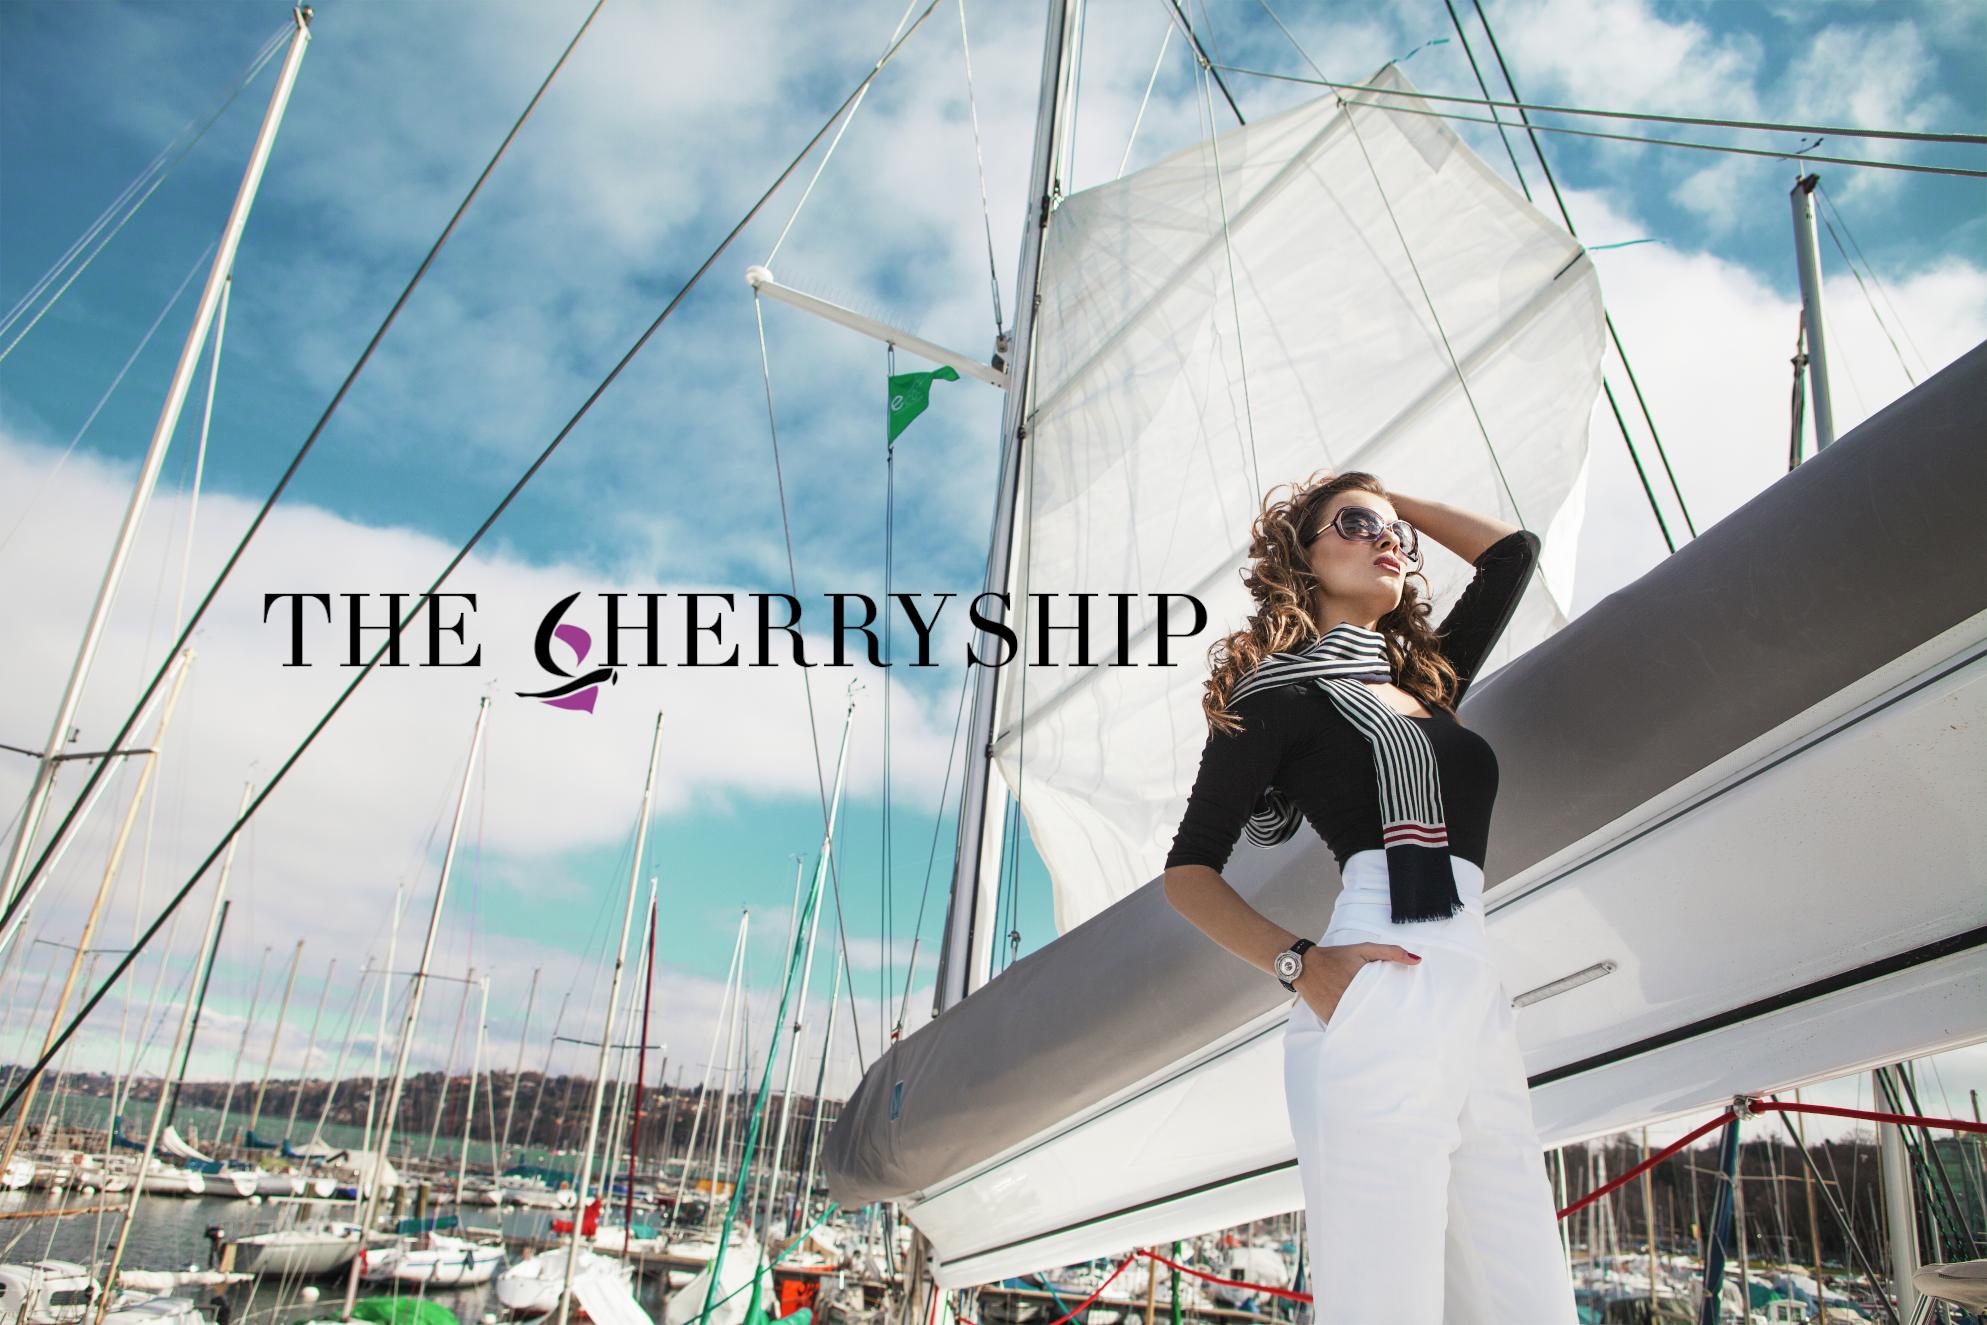 The Cherryship